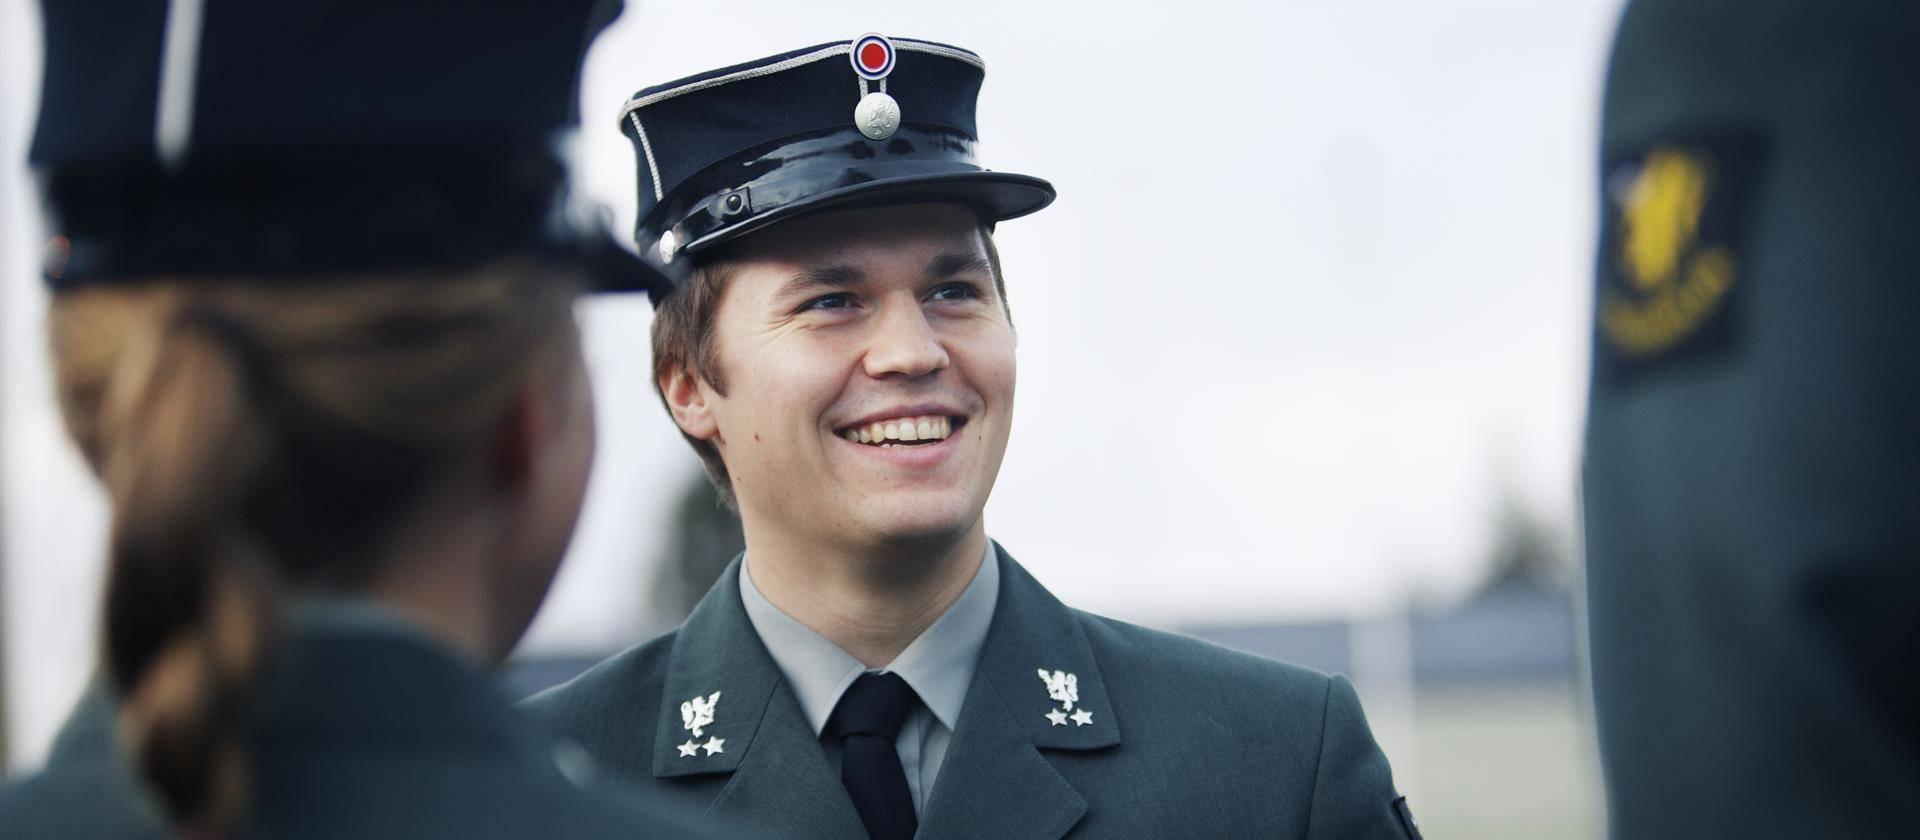 Norwegian Military Academy Emblem